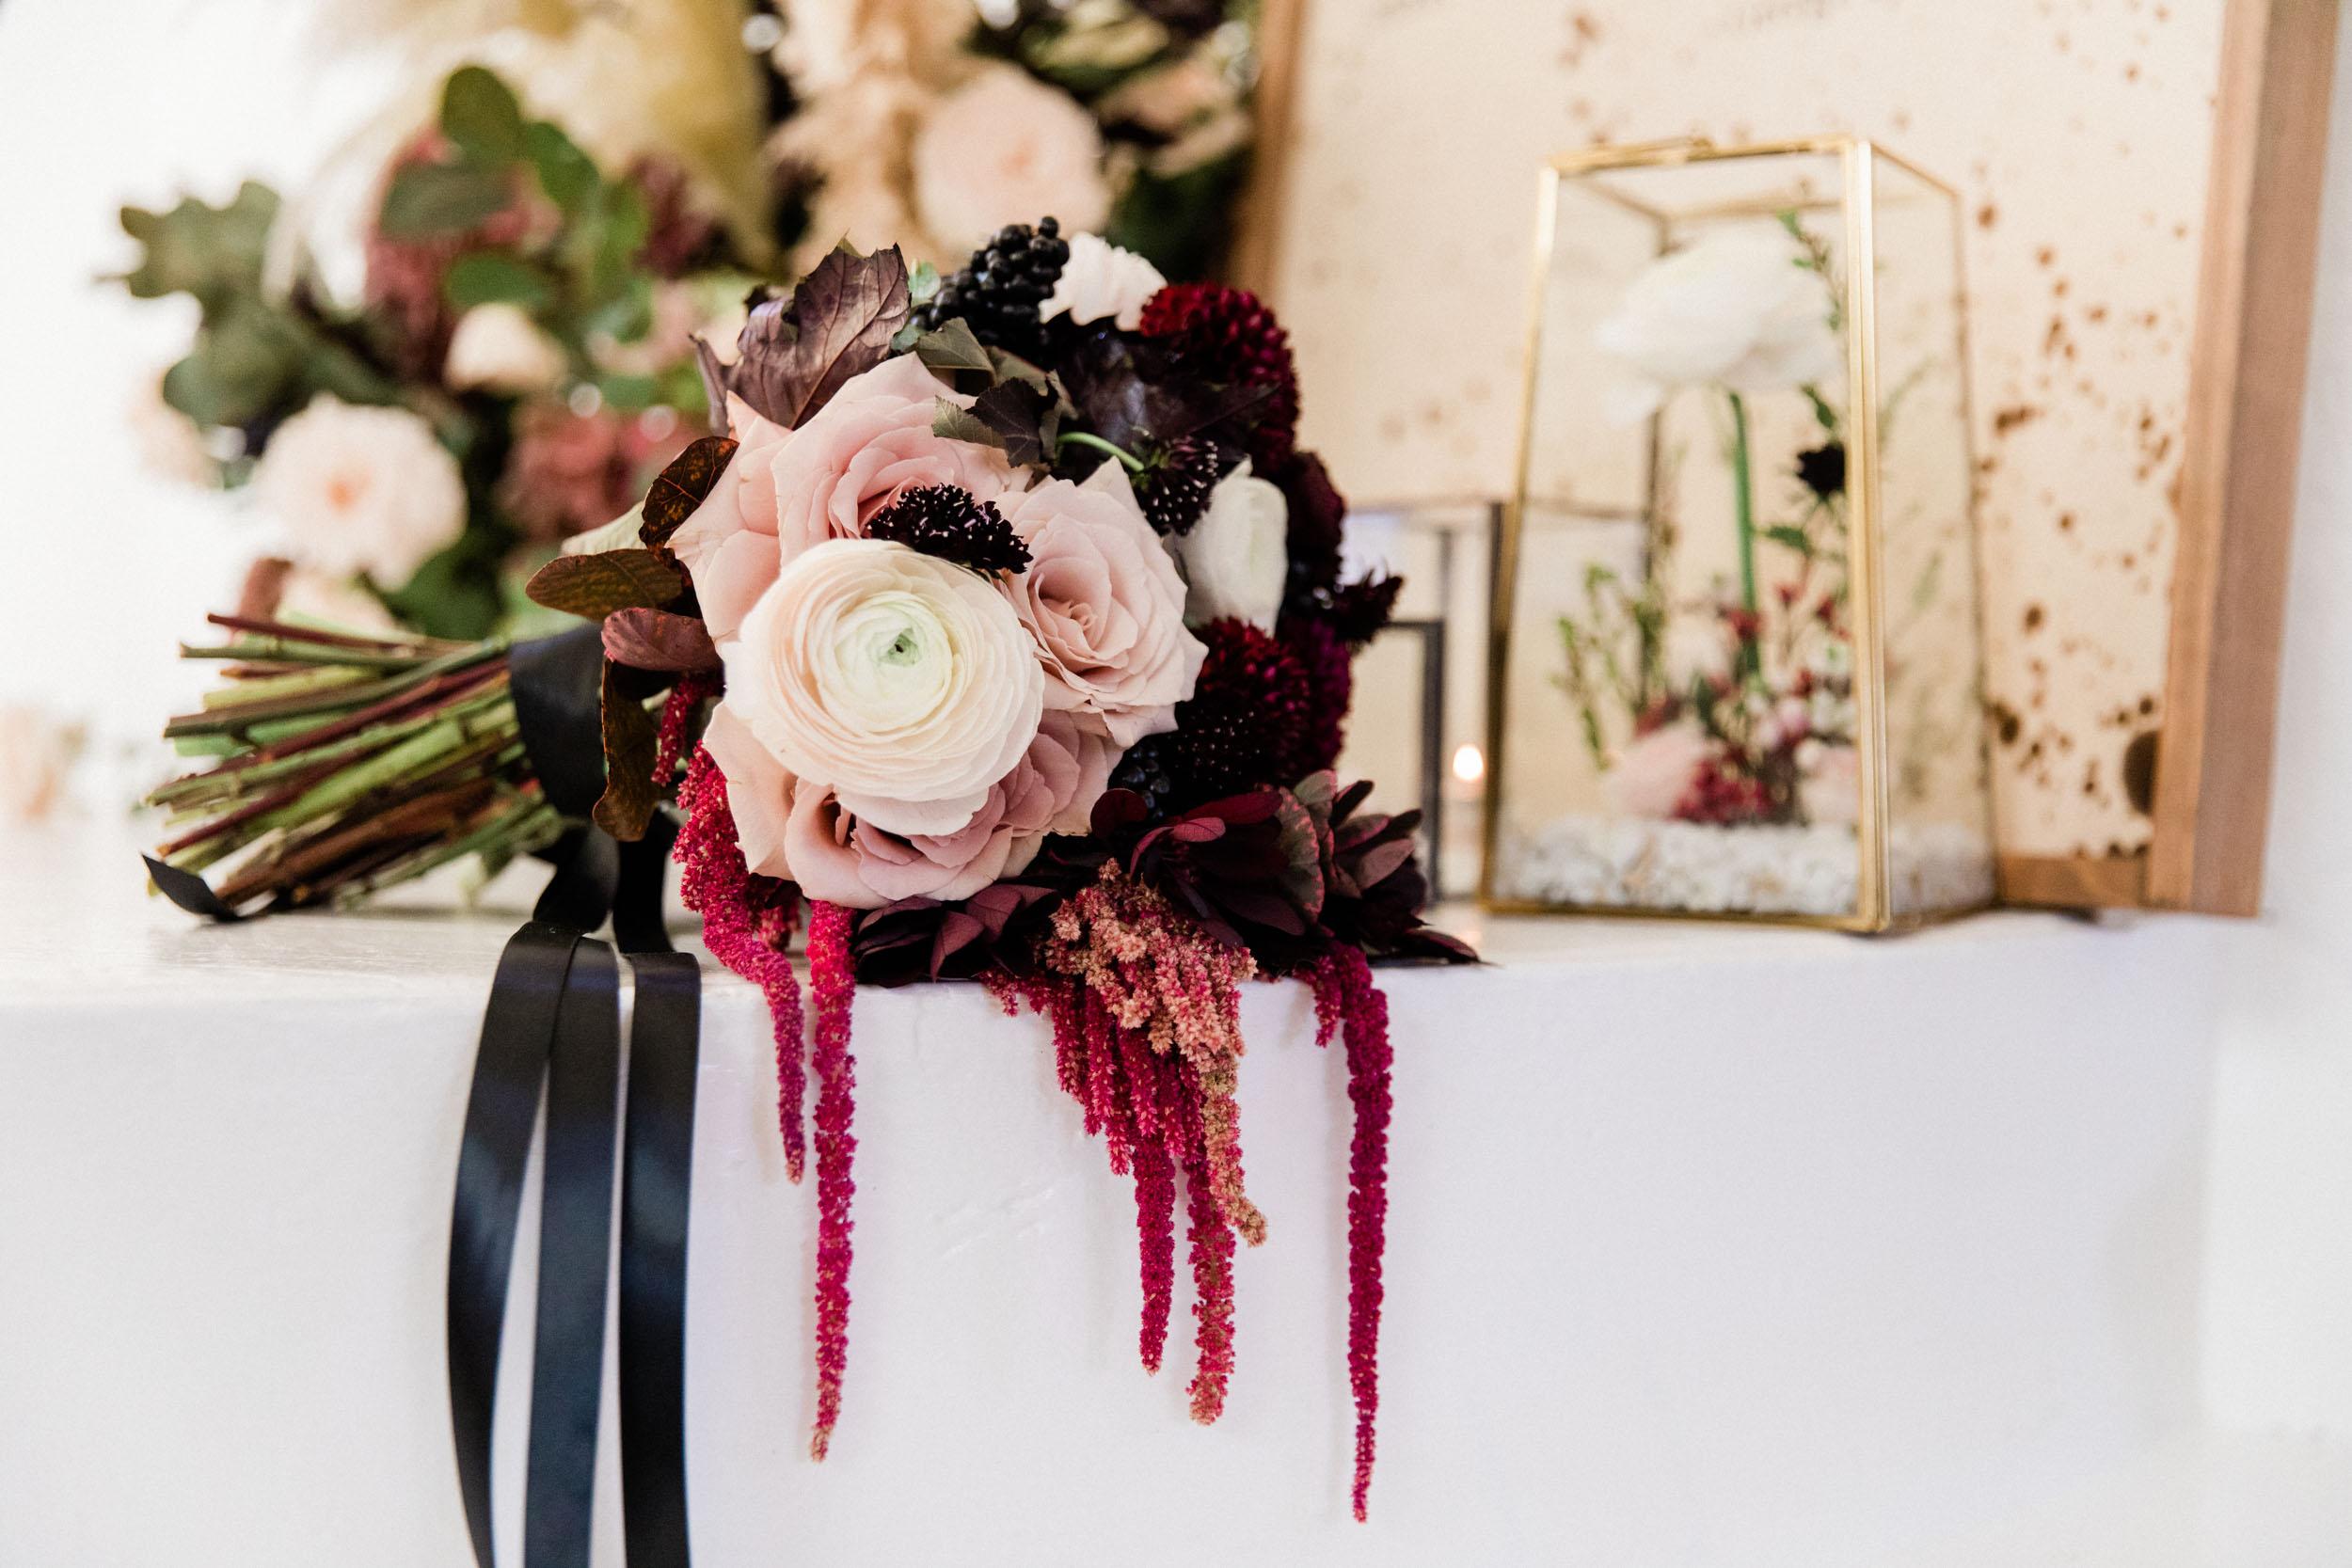 BKM-Photography-Los-Angeles-Highland-Park-York-Manor-Wedding-Photography-0902.jpg